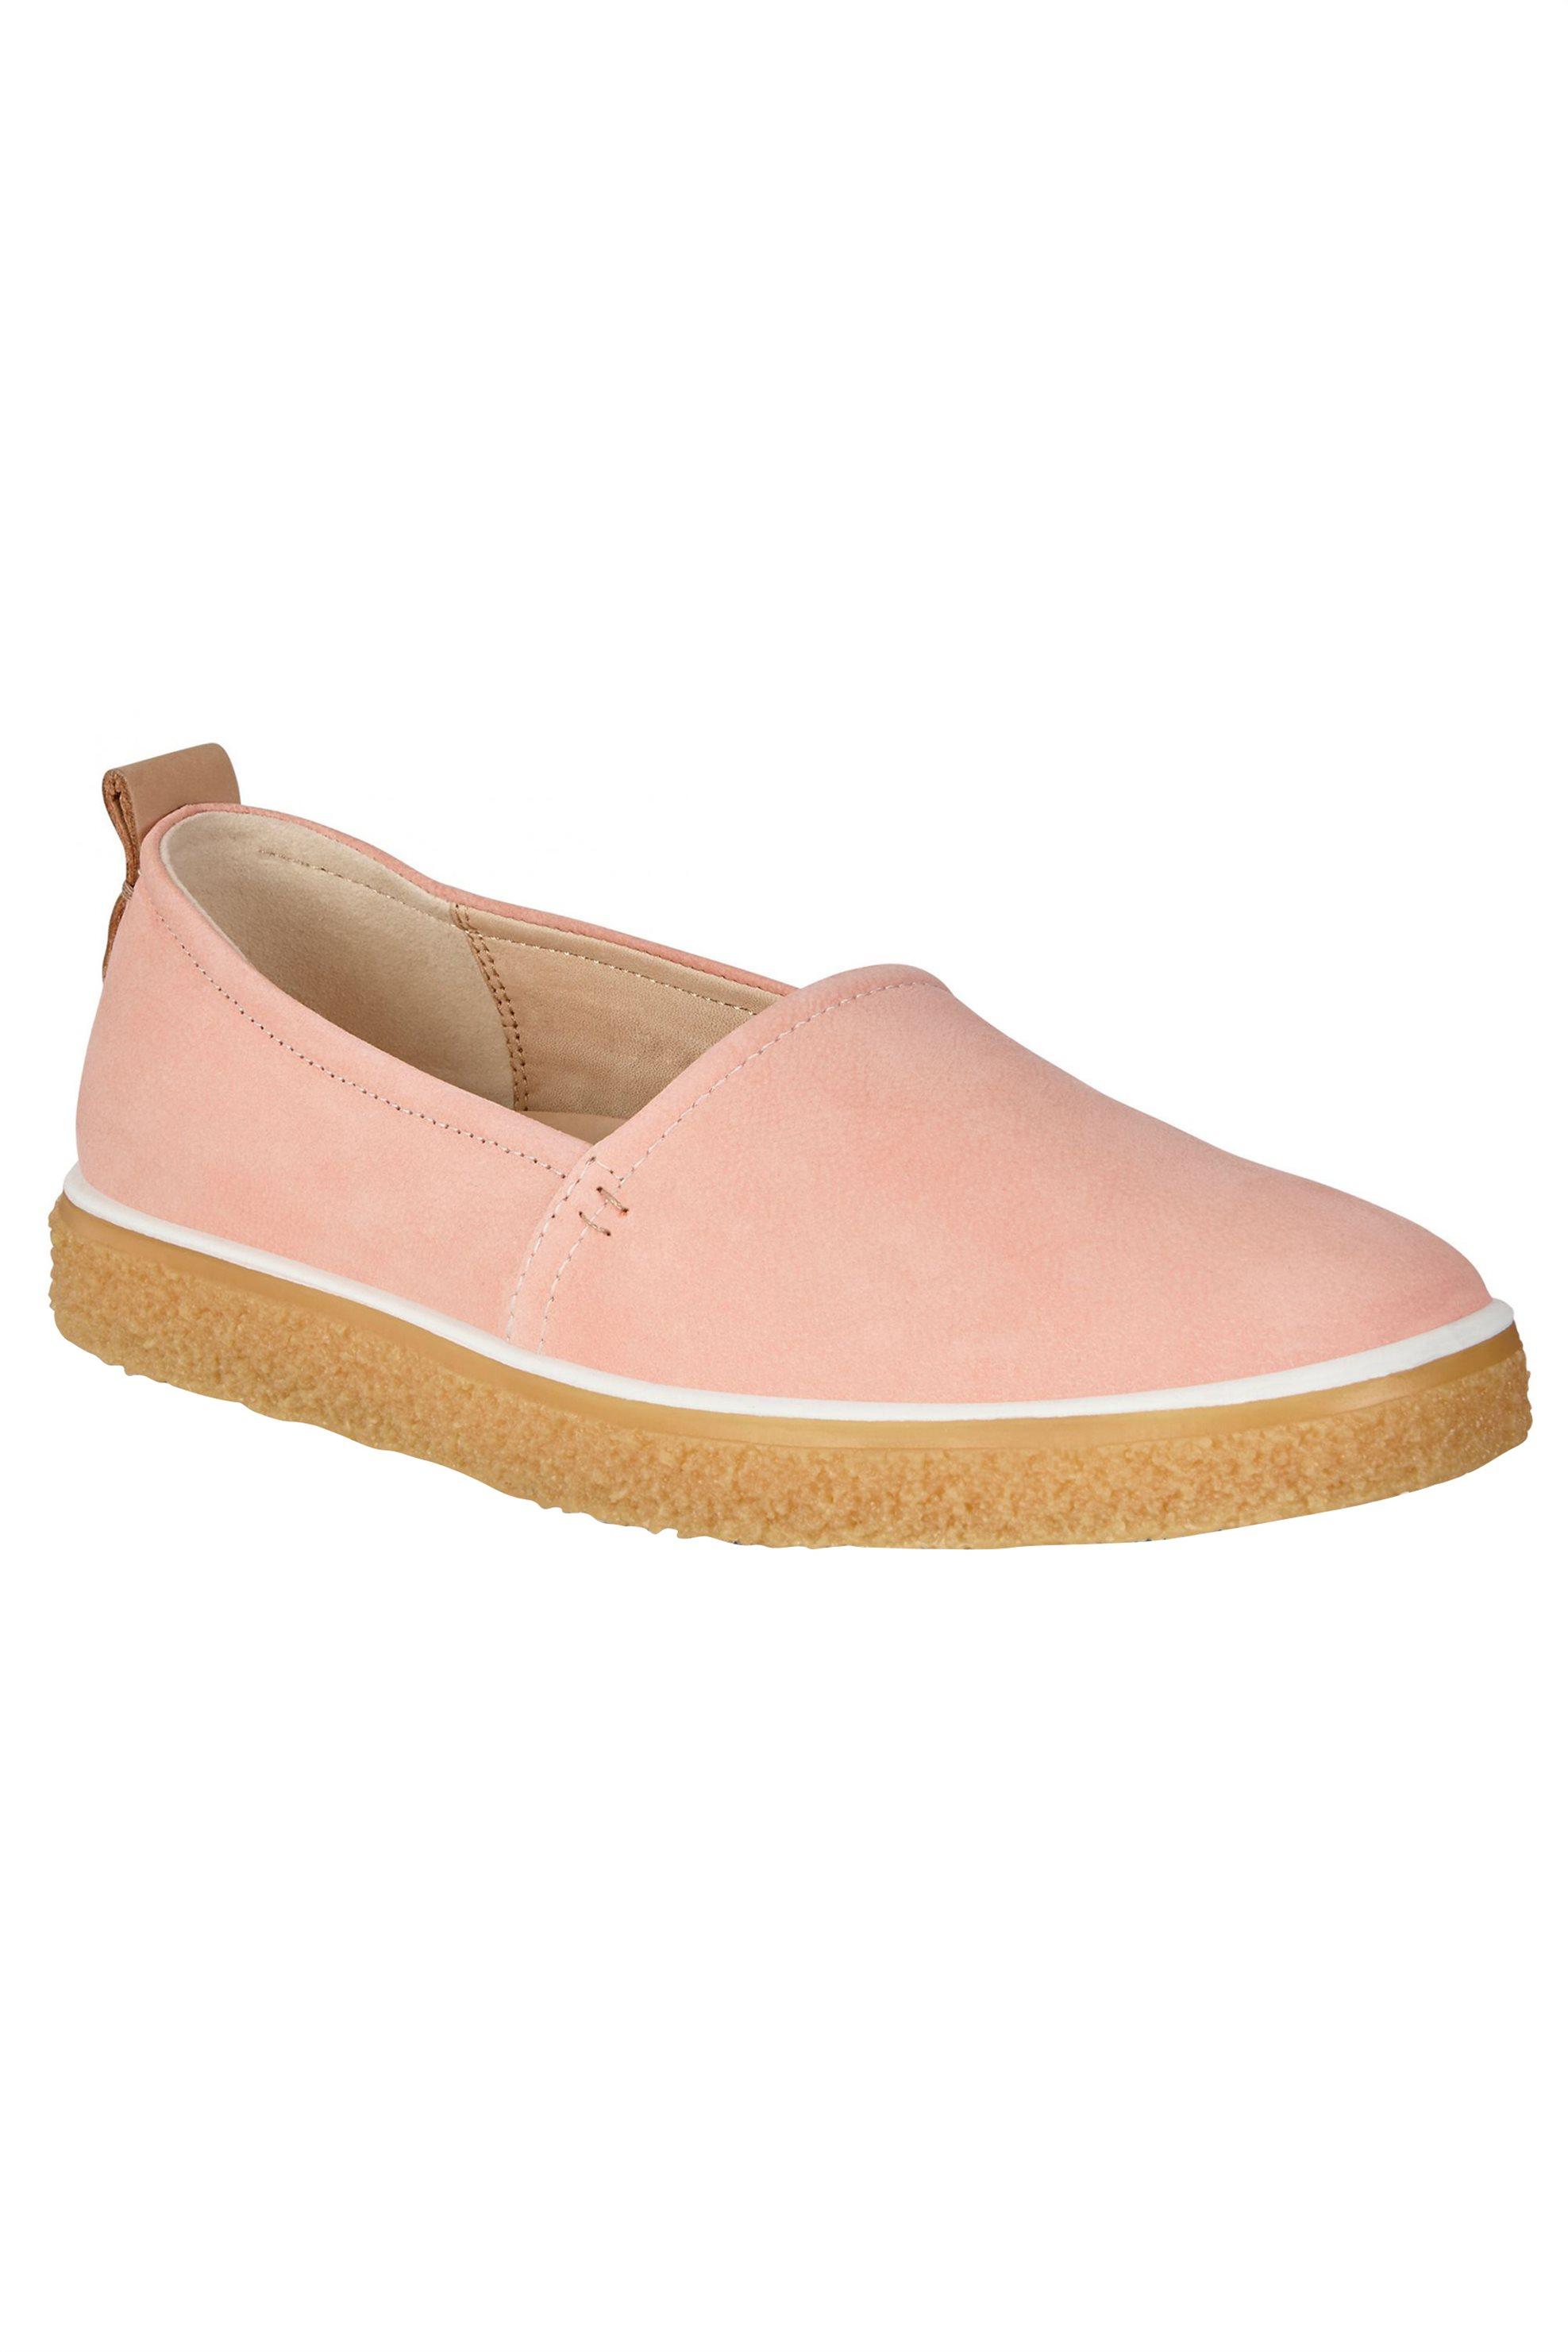 b3379f85cc Notos Γυναικεία παπούτσια Crepetray ECCO - 200303 - Ροζ